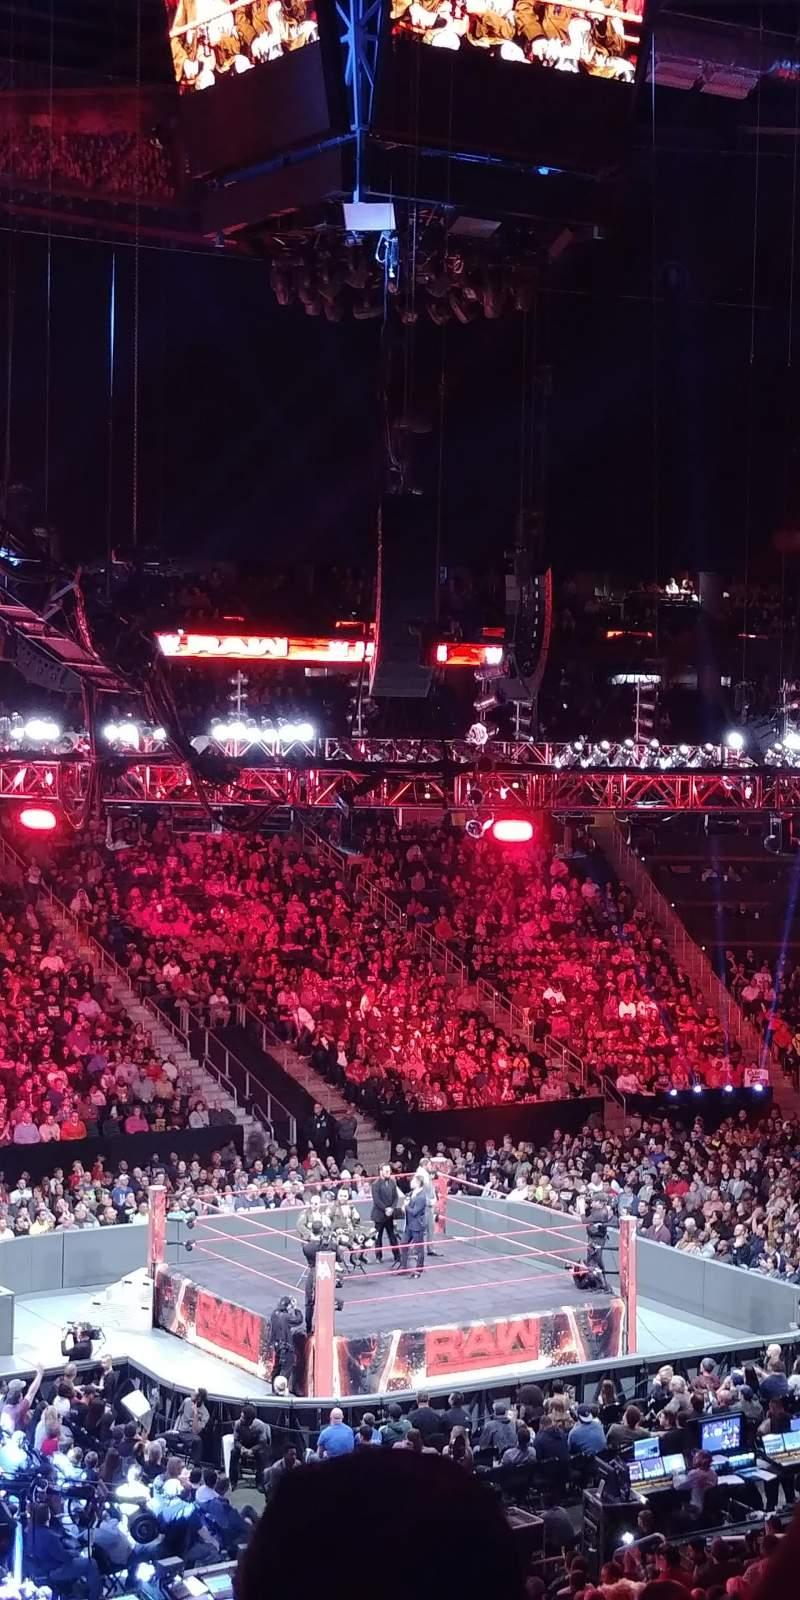 Philips Arena, Abschnitt: 213, Reihe: E, Platz: 17